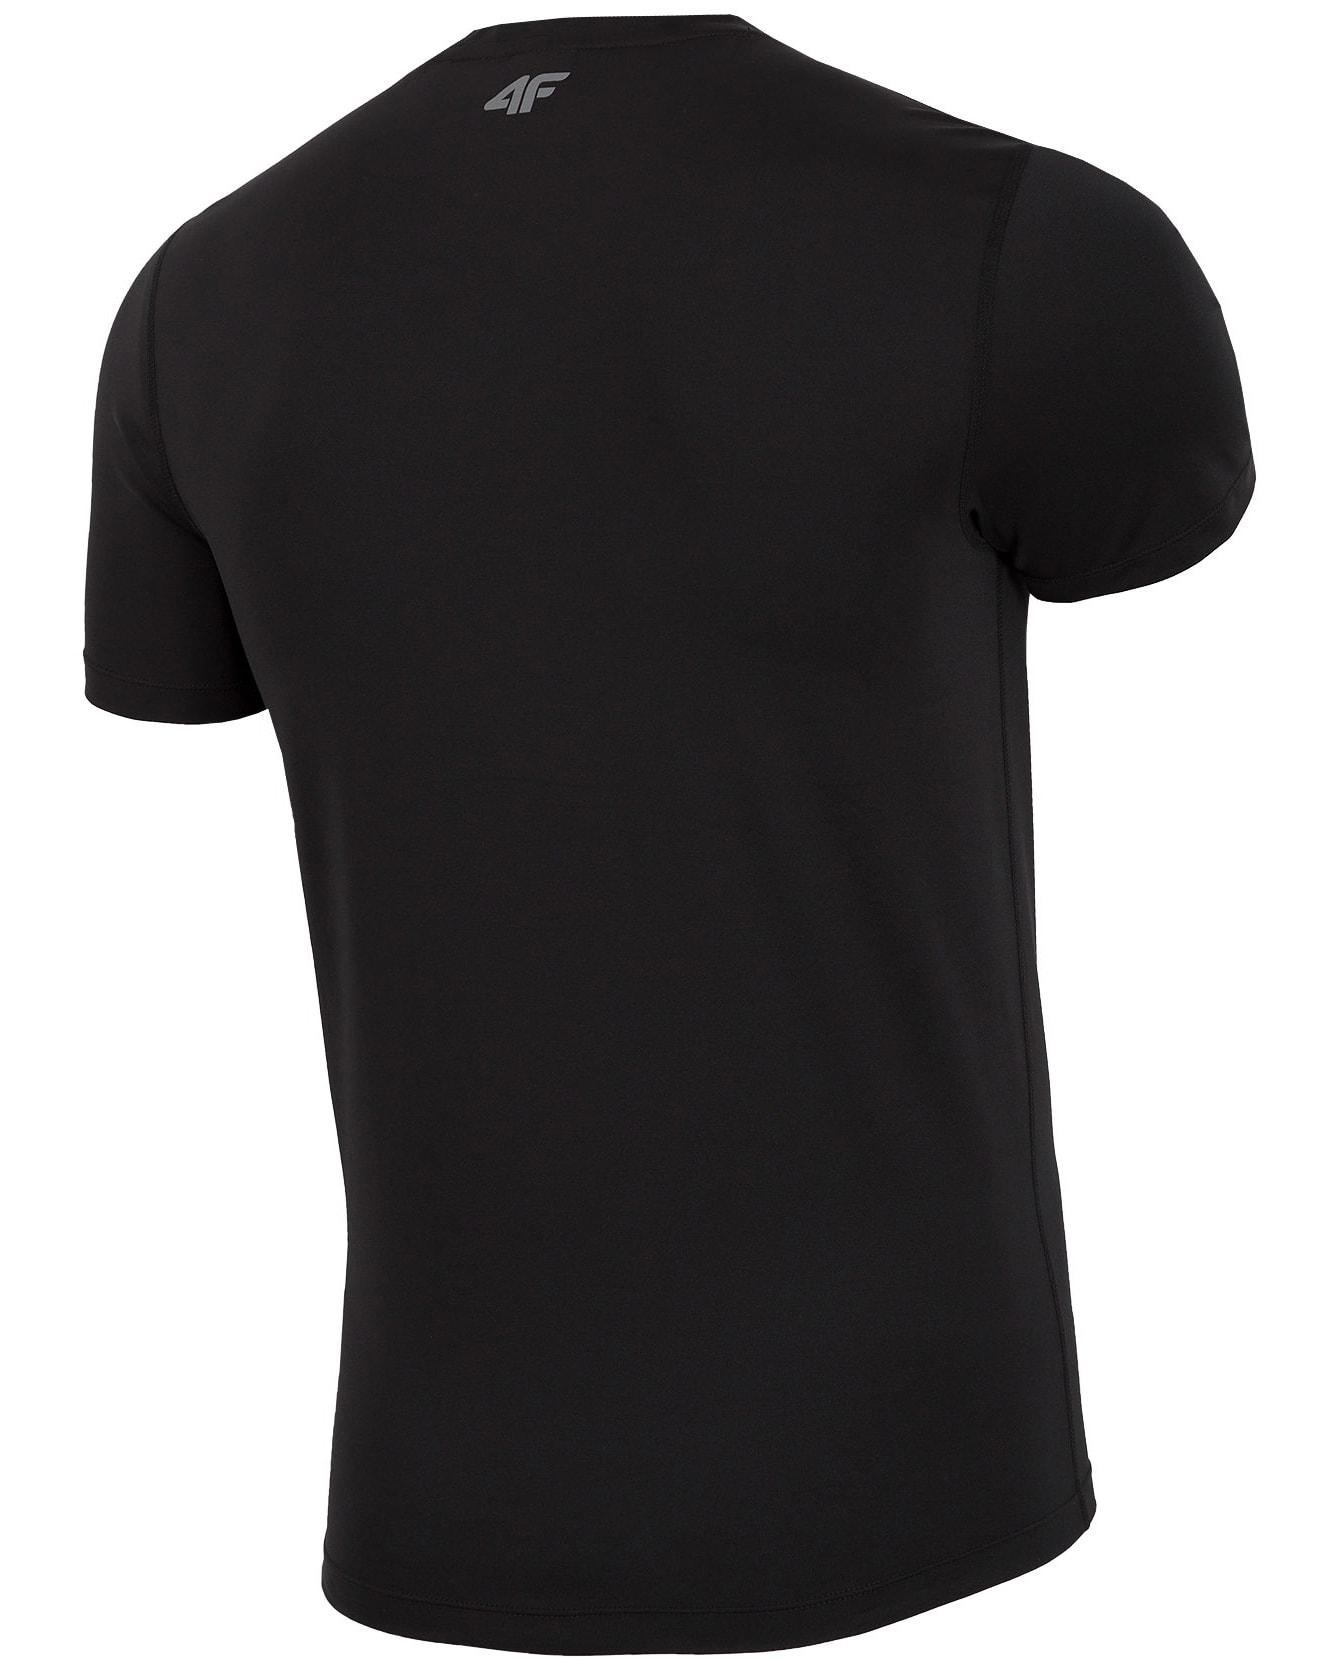 4F Man's Functional T-shirt - Black